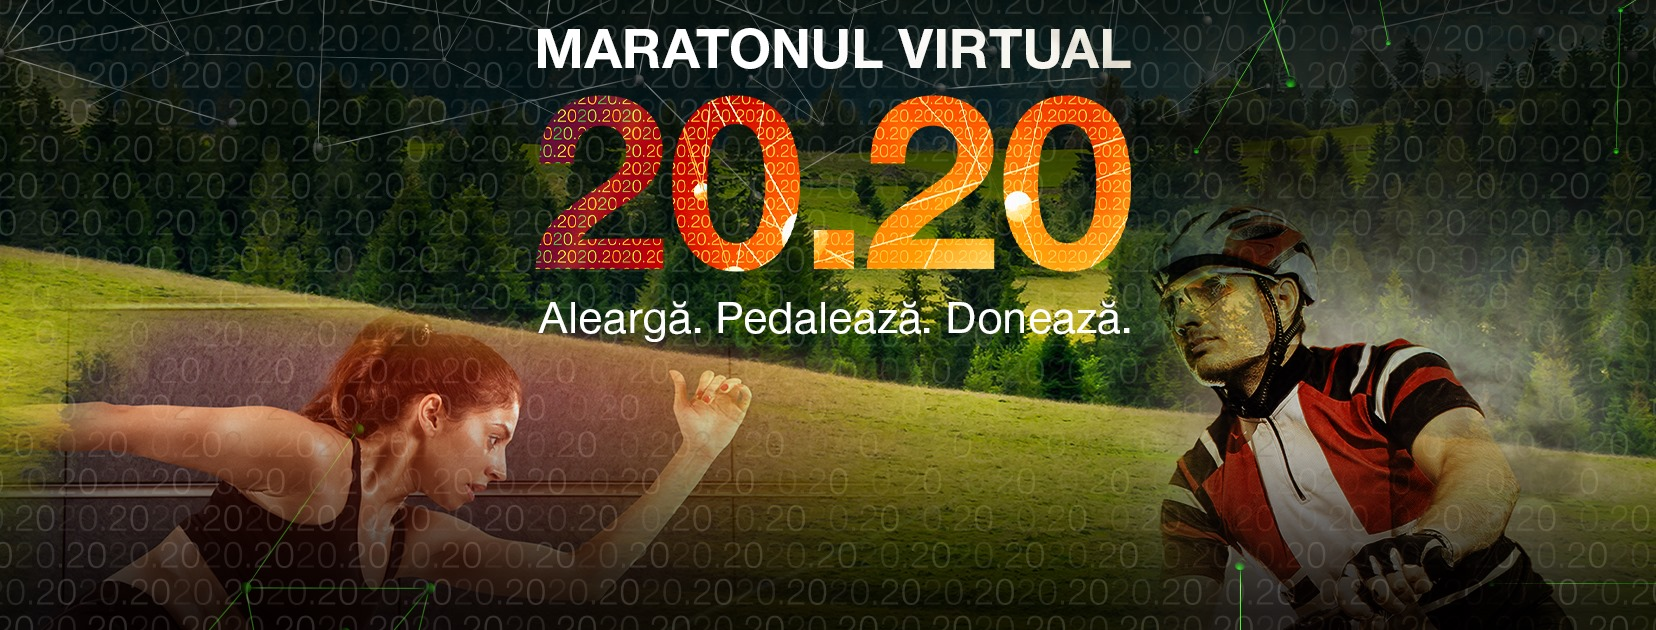 maratonul 20 20